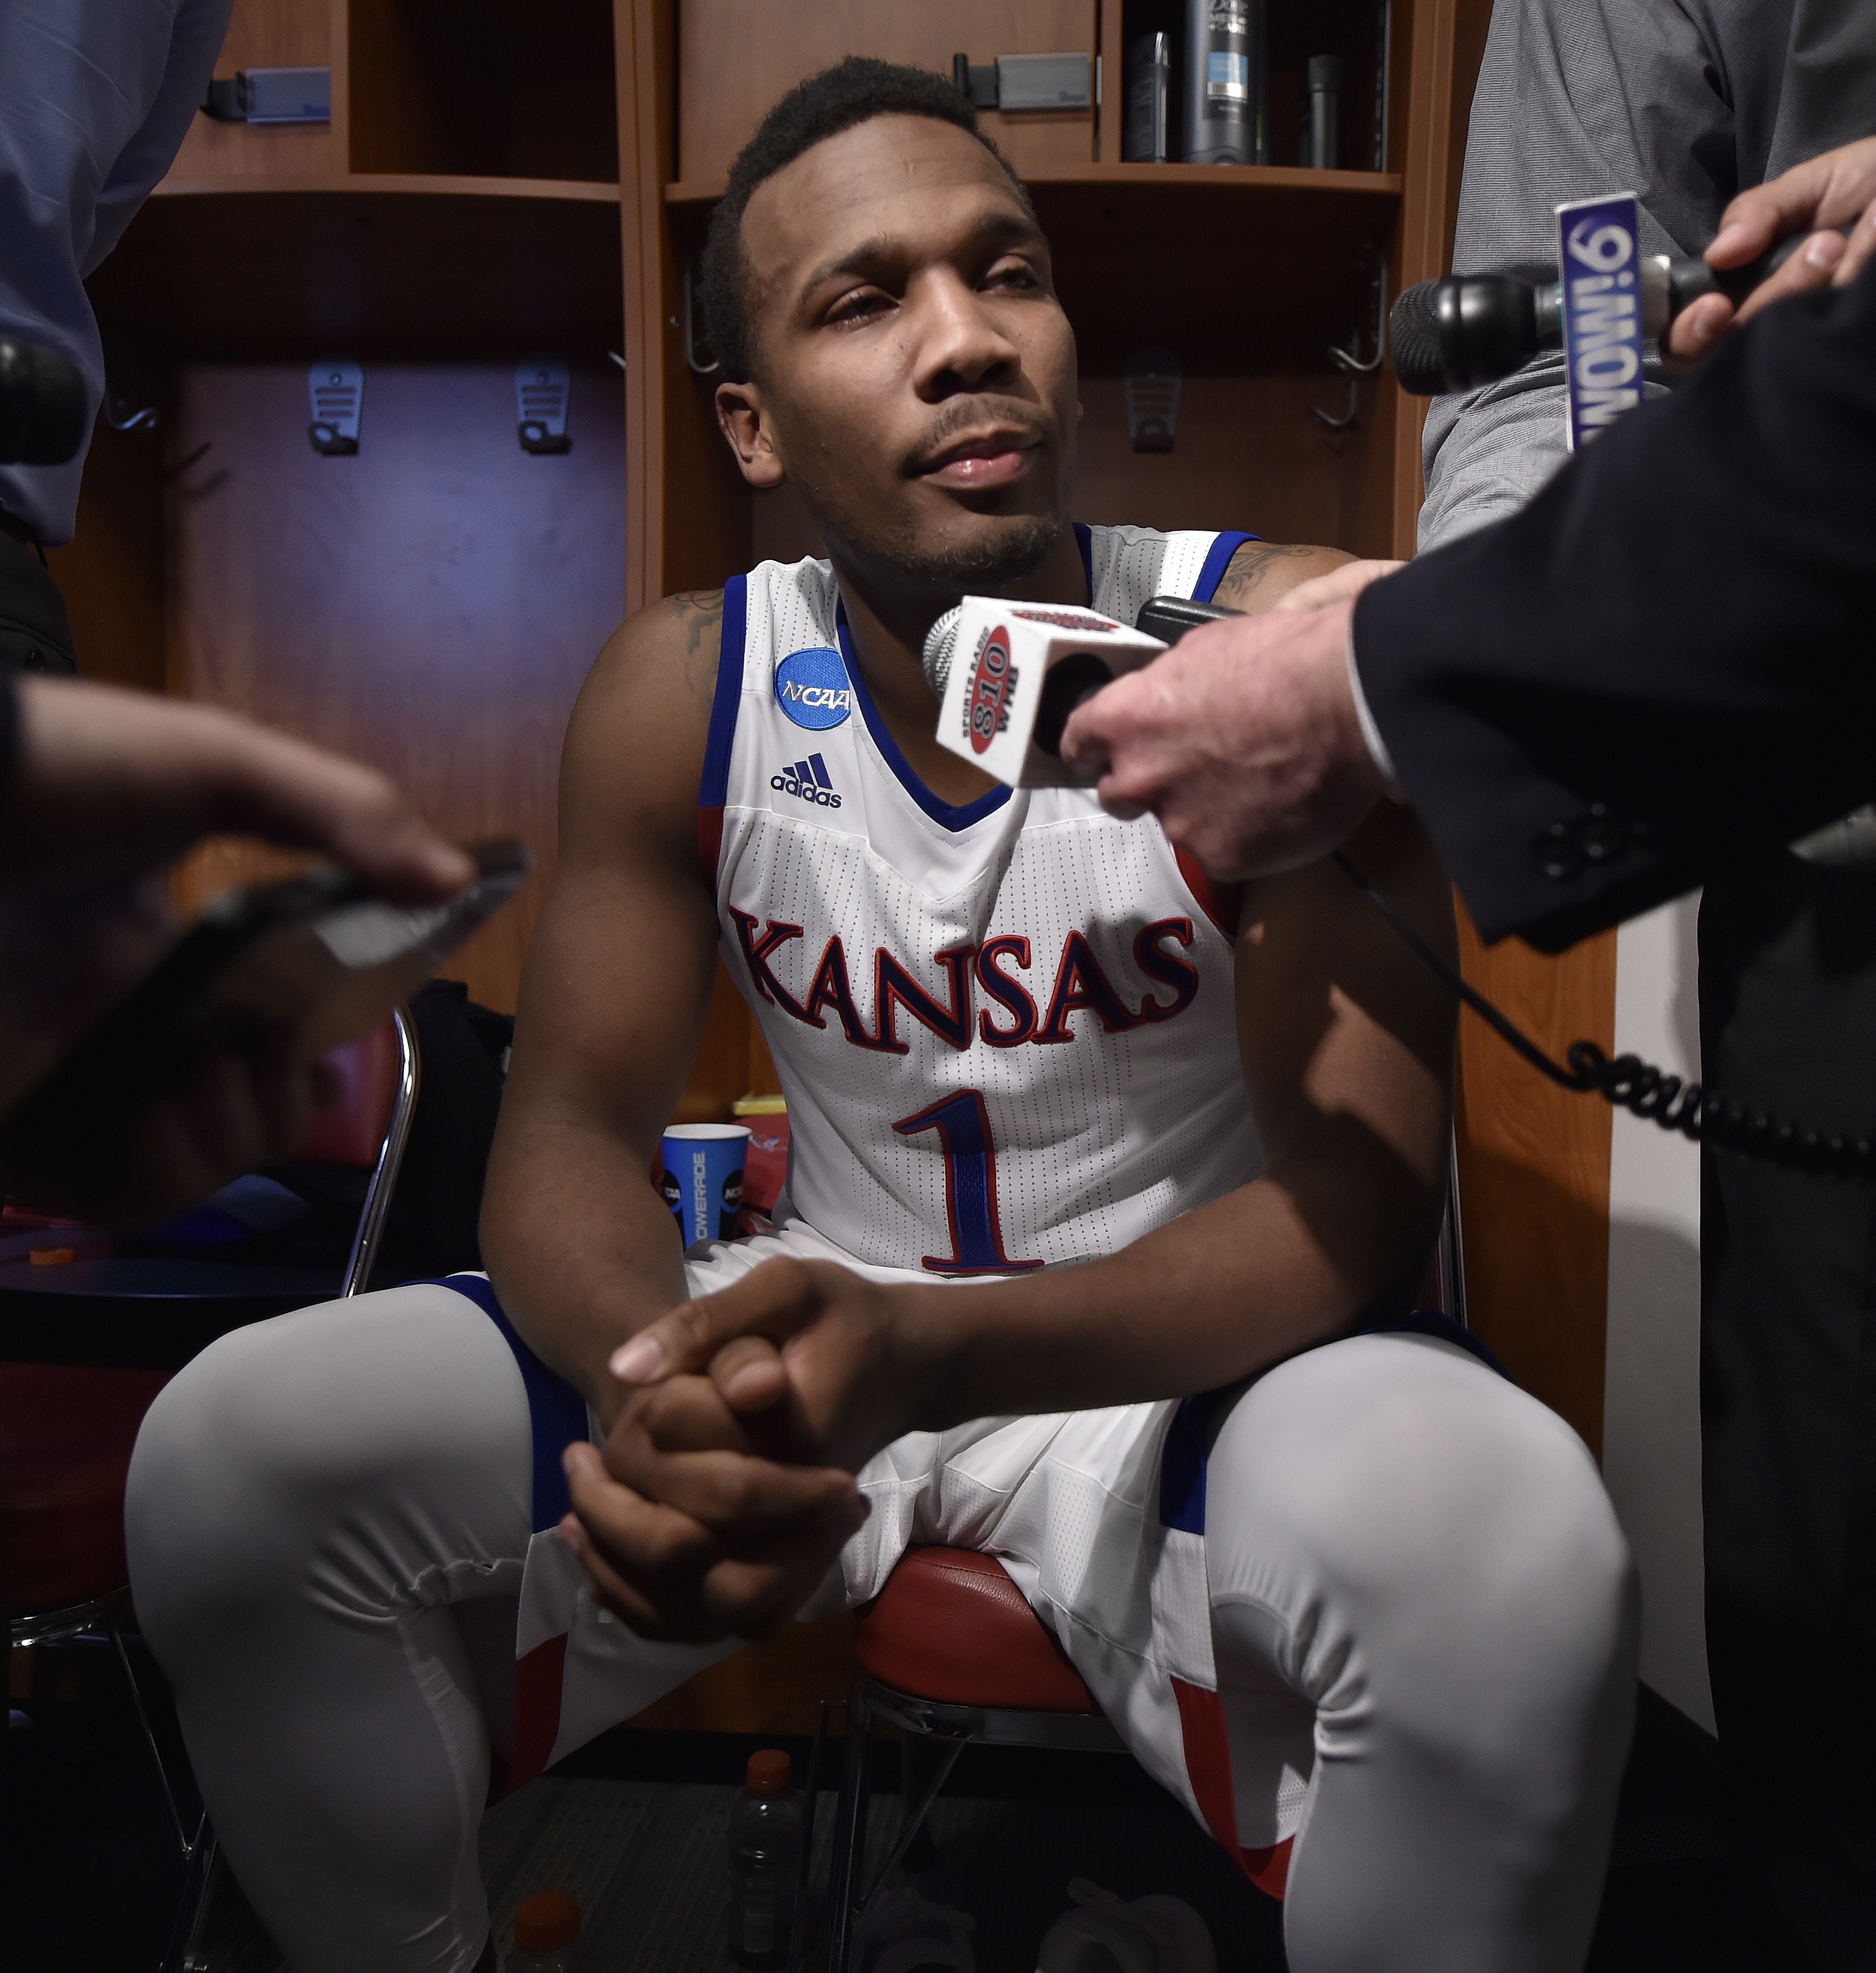 Kansas's Wayne Selden Jr., is interviewed in the locker room after a regional final men's college basketball game against Villanova in the NCAA Tournament, Saturday, March 26, 2016, in Louisville, Ky. Villanova won 64-59.(AP Photo/John Flavell)